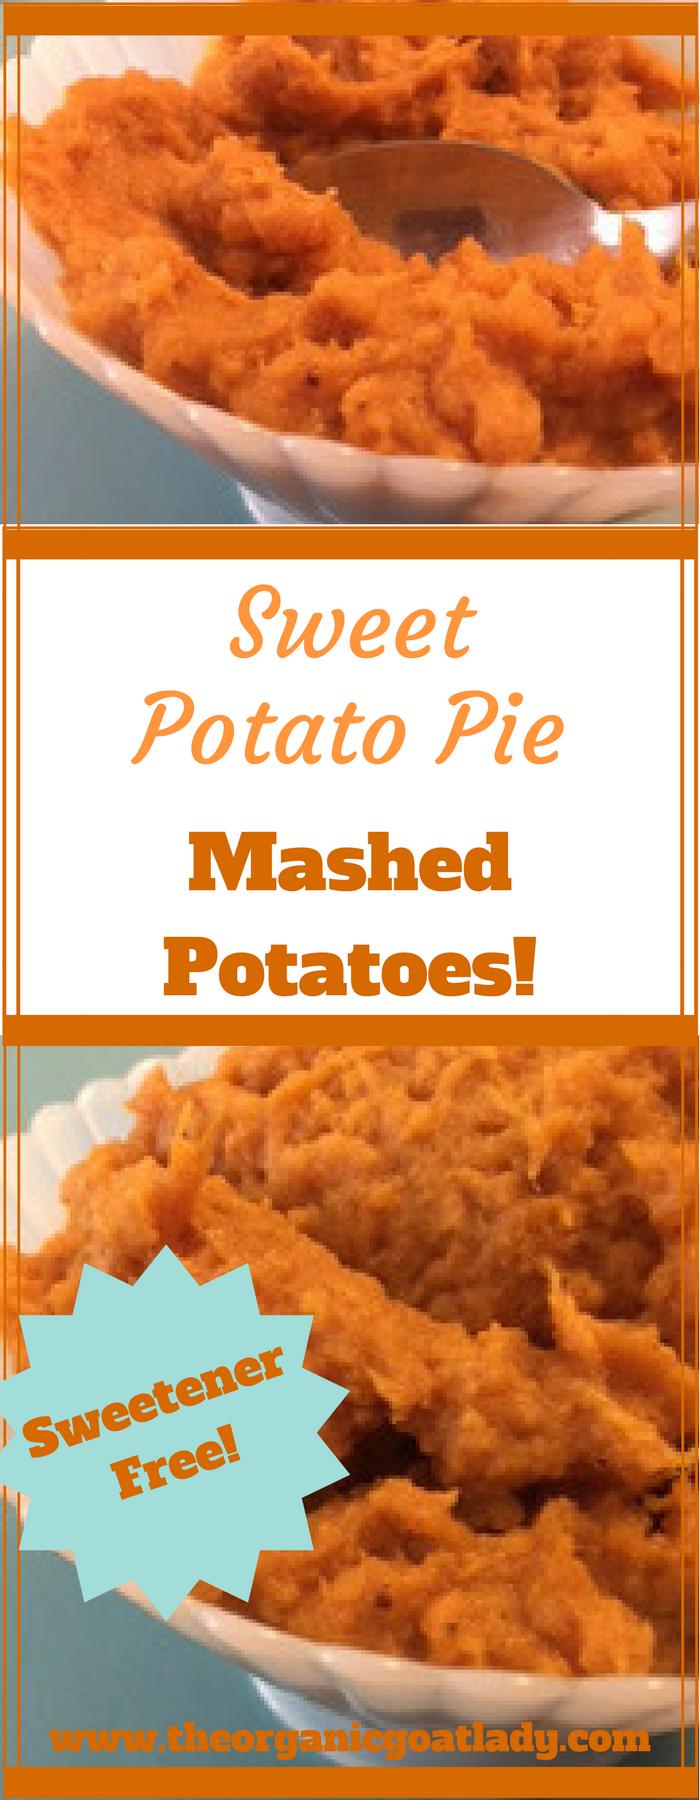 Sweet Potato Pie Mashed Potatoes!